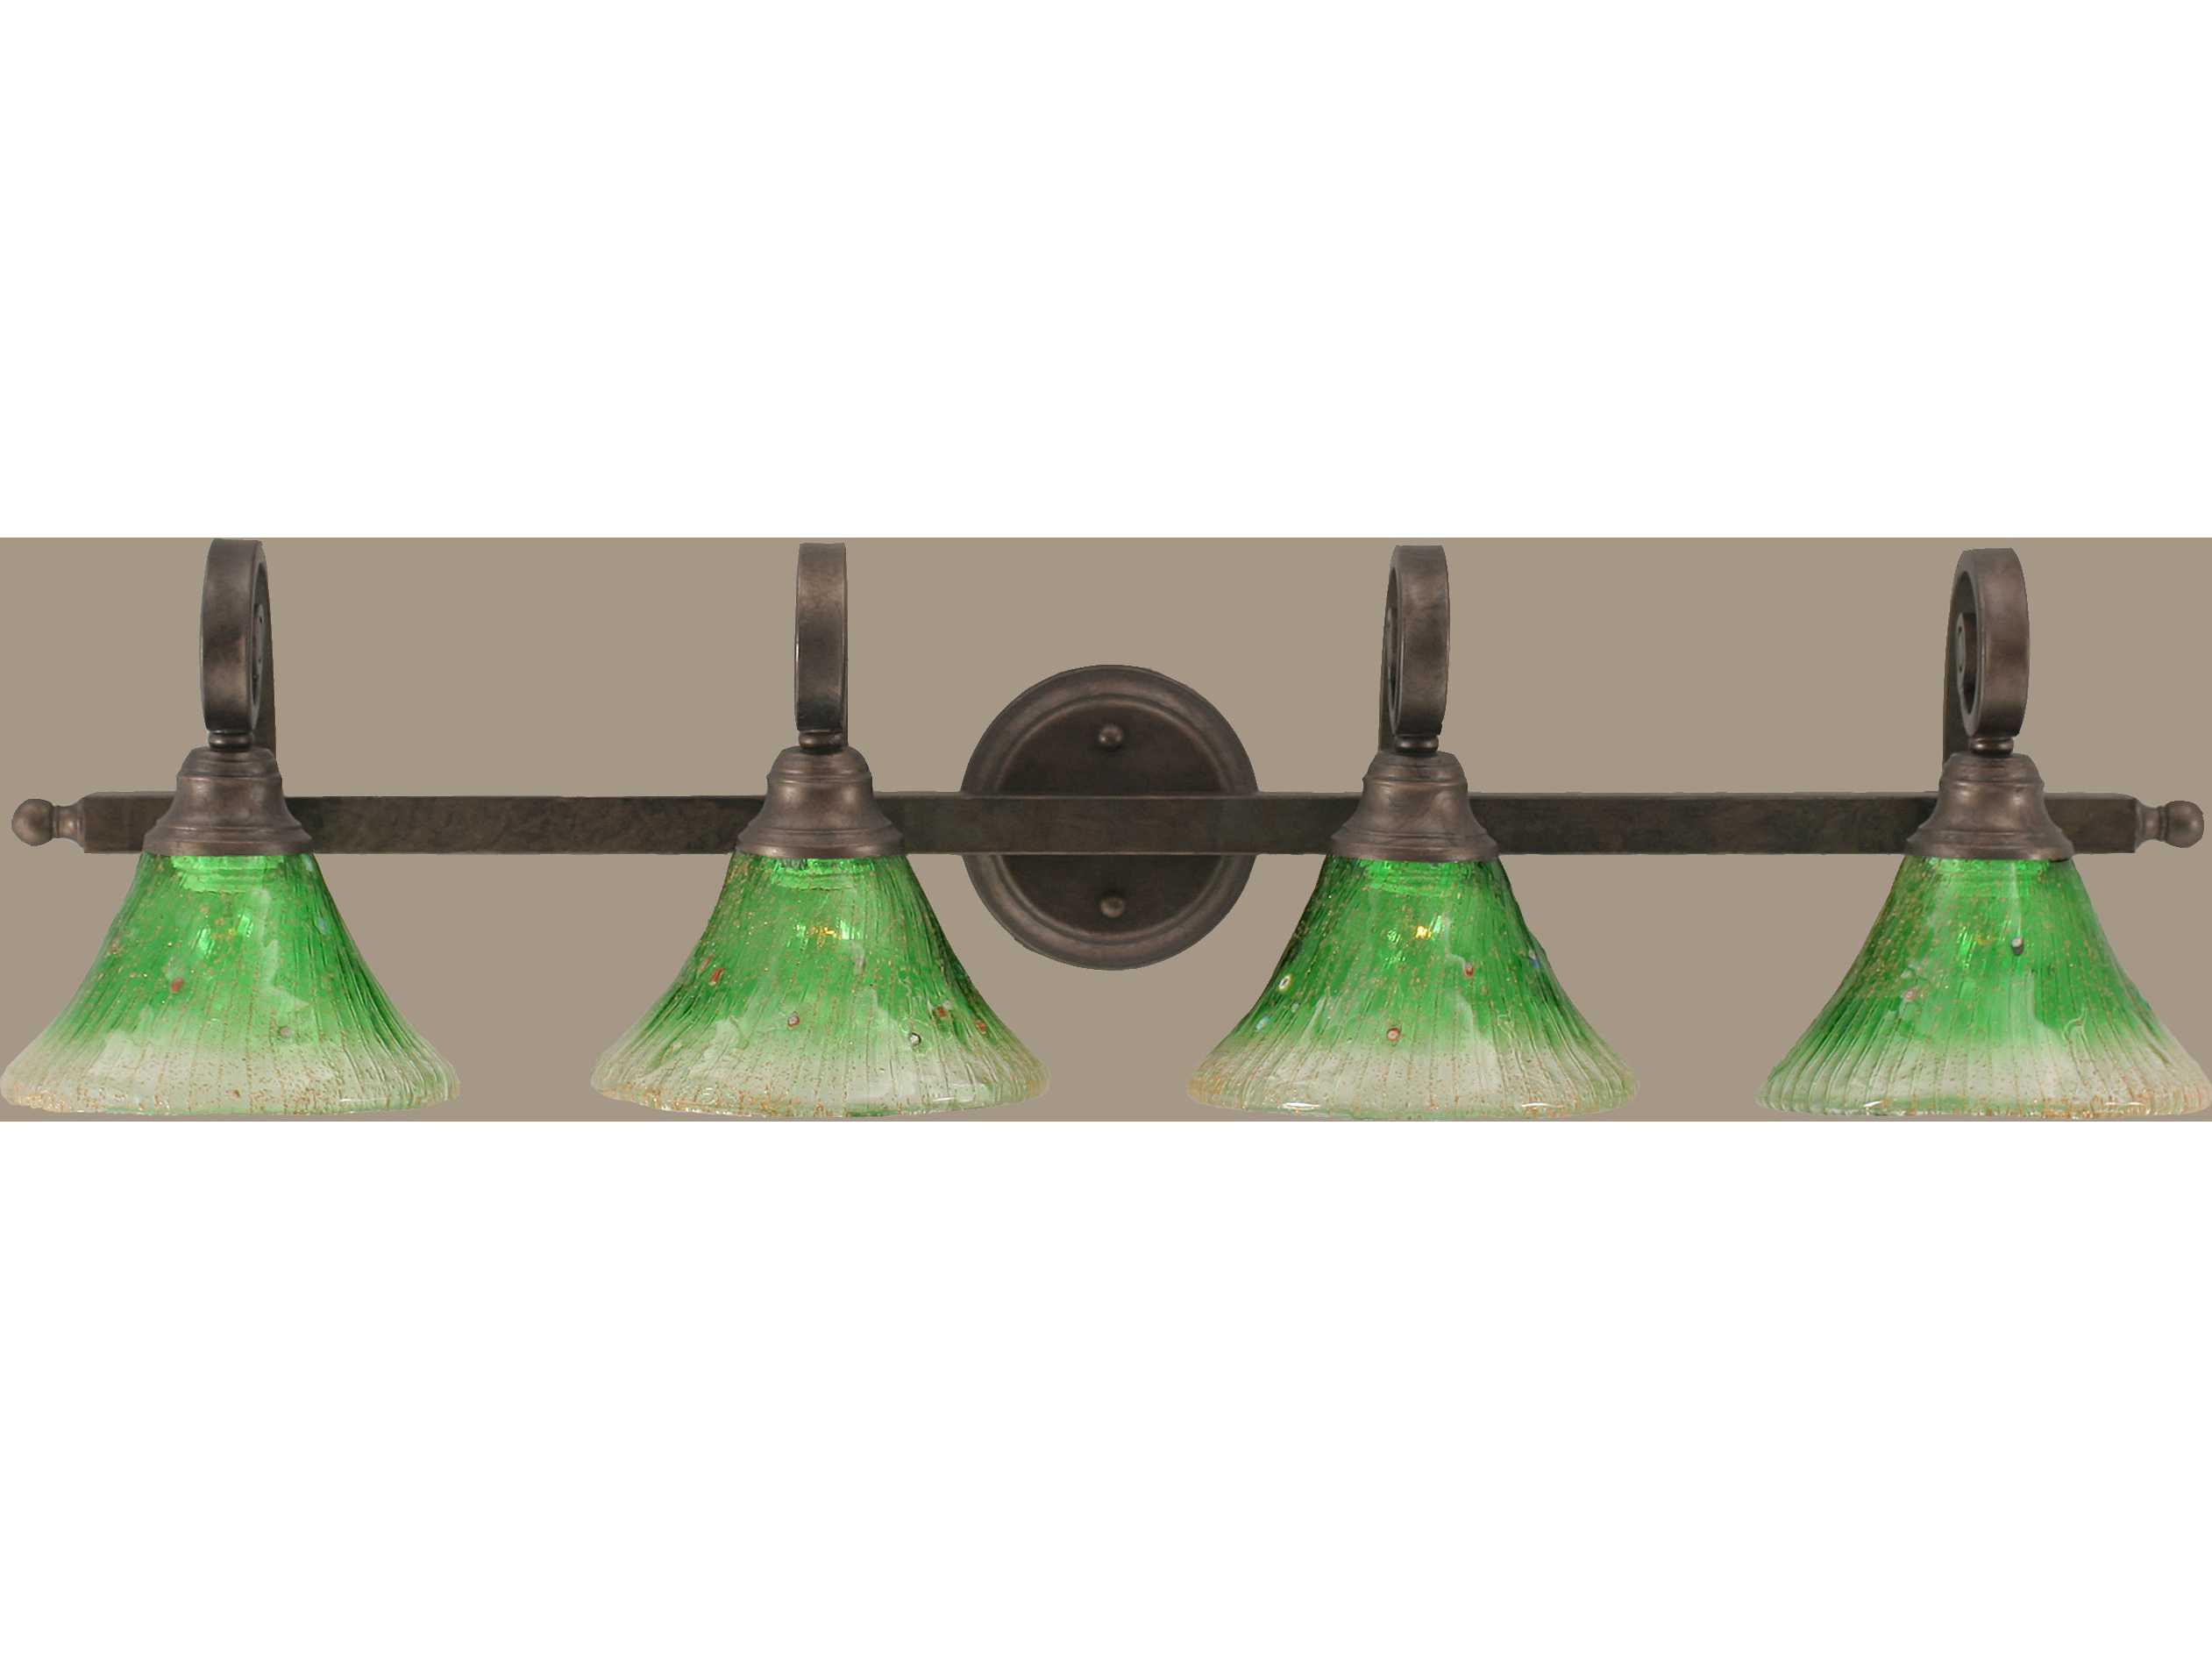 Toltec Lighting Curl Bronze & Kiwi Green Crystal Glass Four-Light Vanity Light TOL154BRZ753